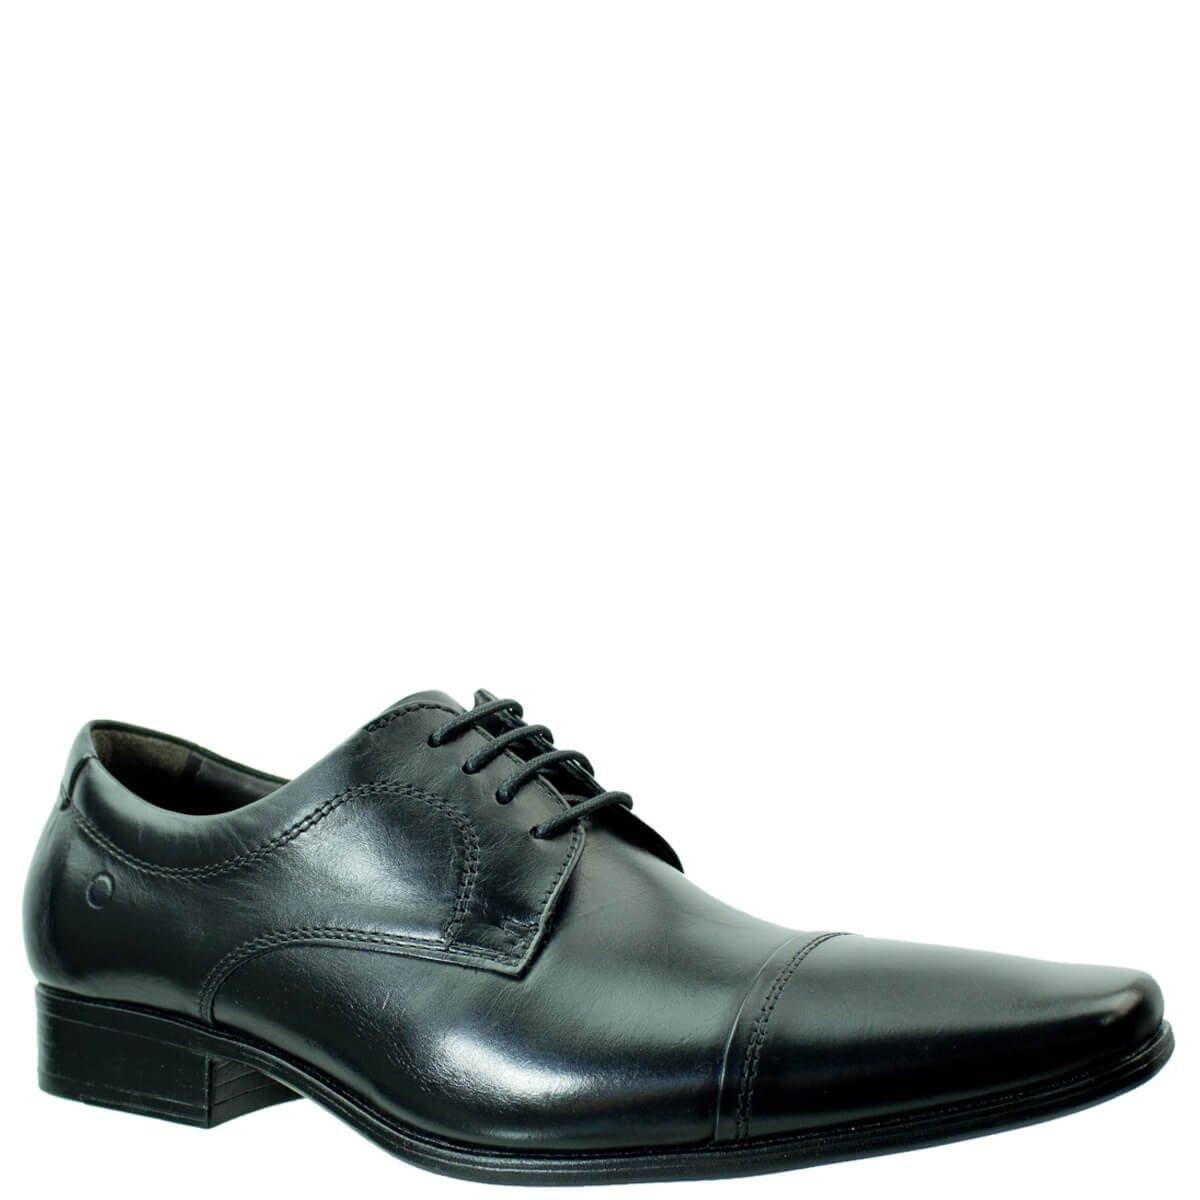 5864dcdf6a7 sapato social masculino democrata aspen couro. Carregando zoom.